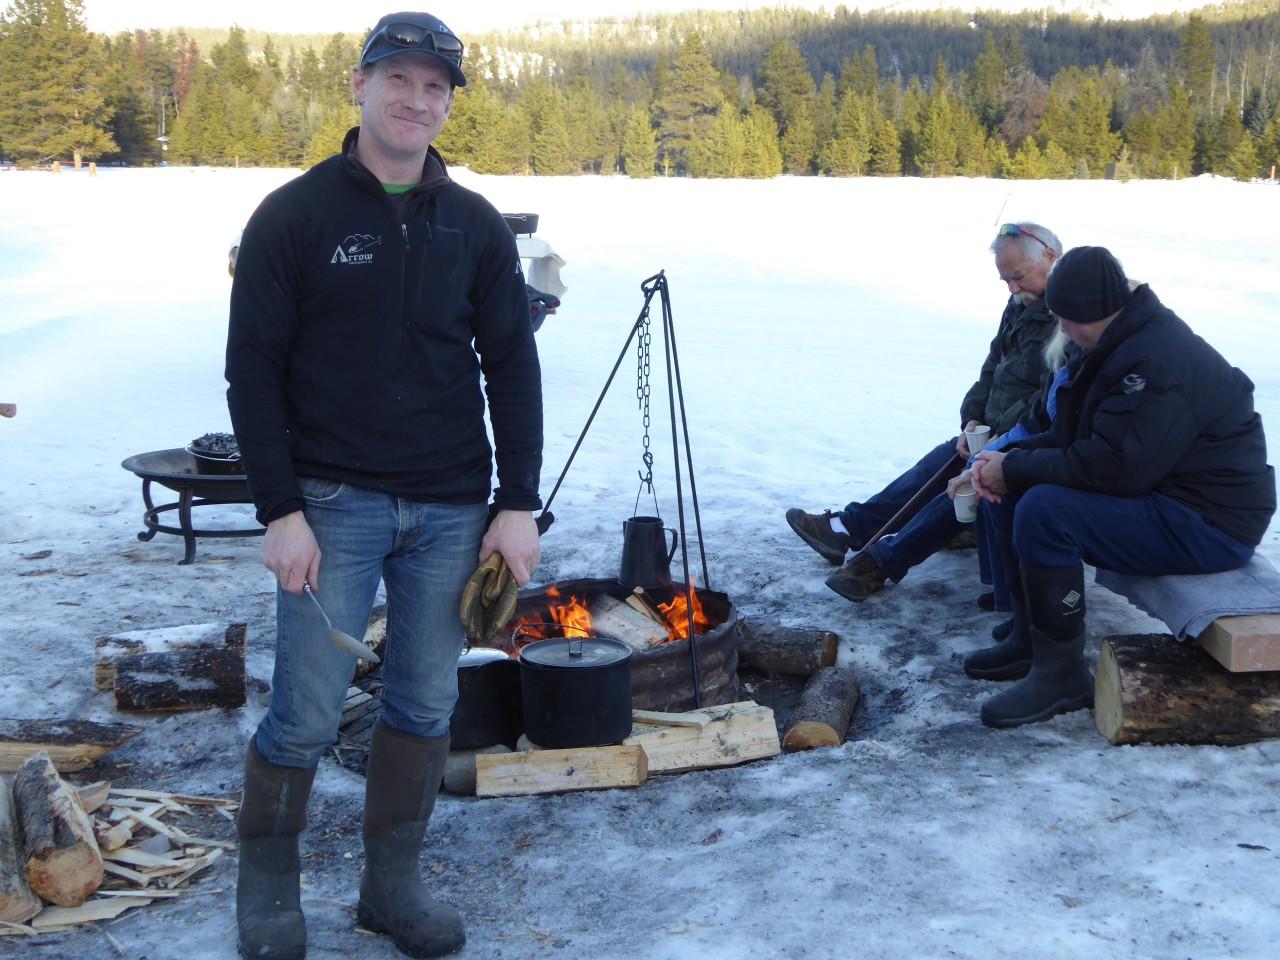 Jasper campfire cooking